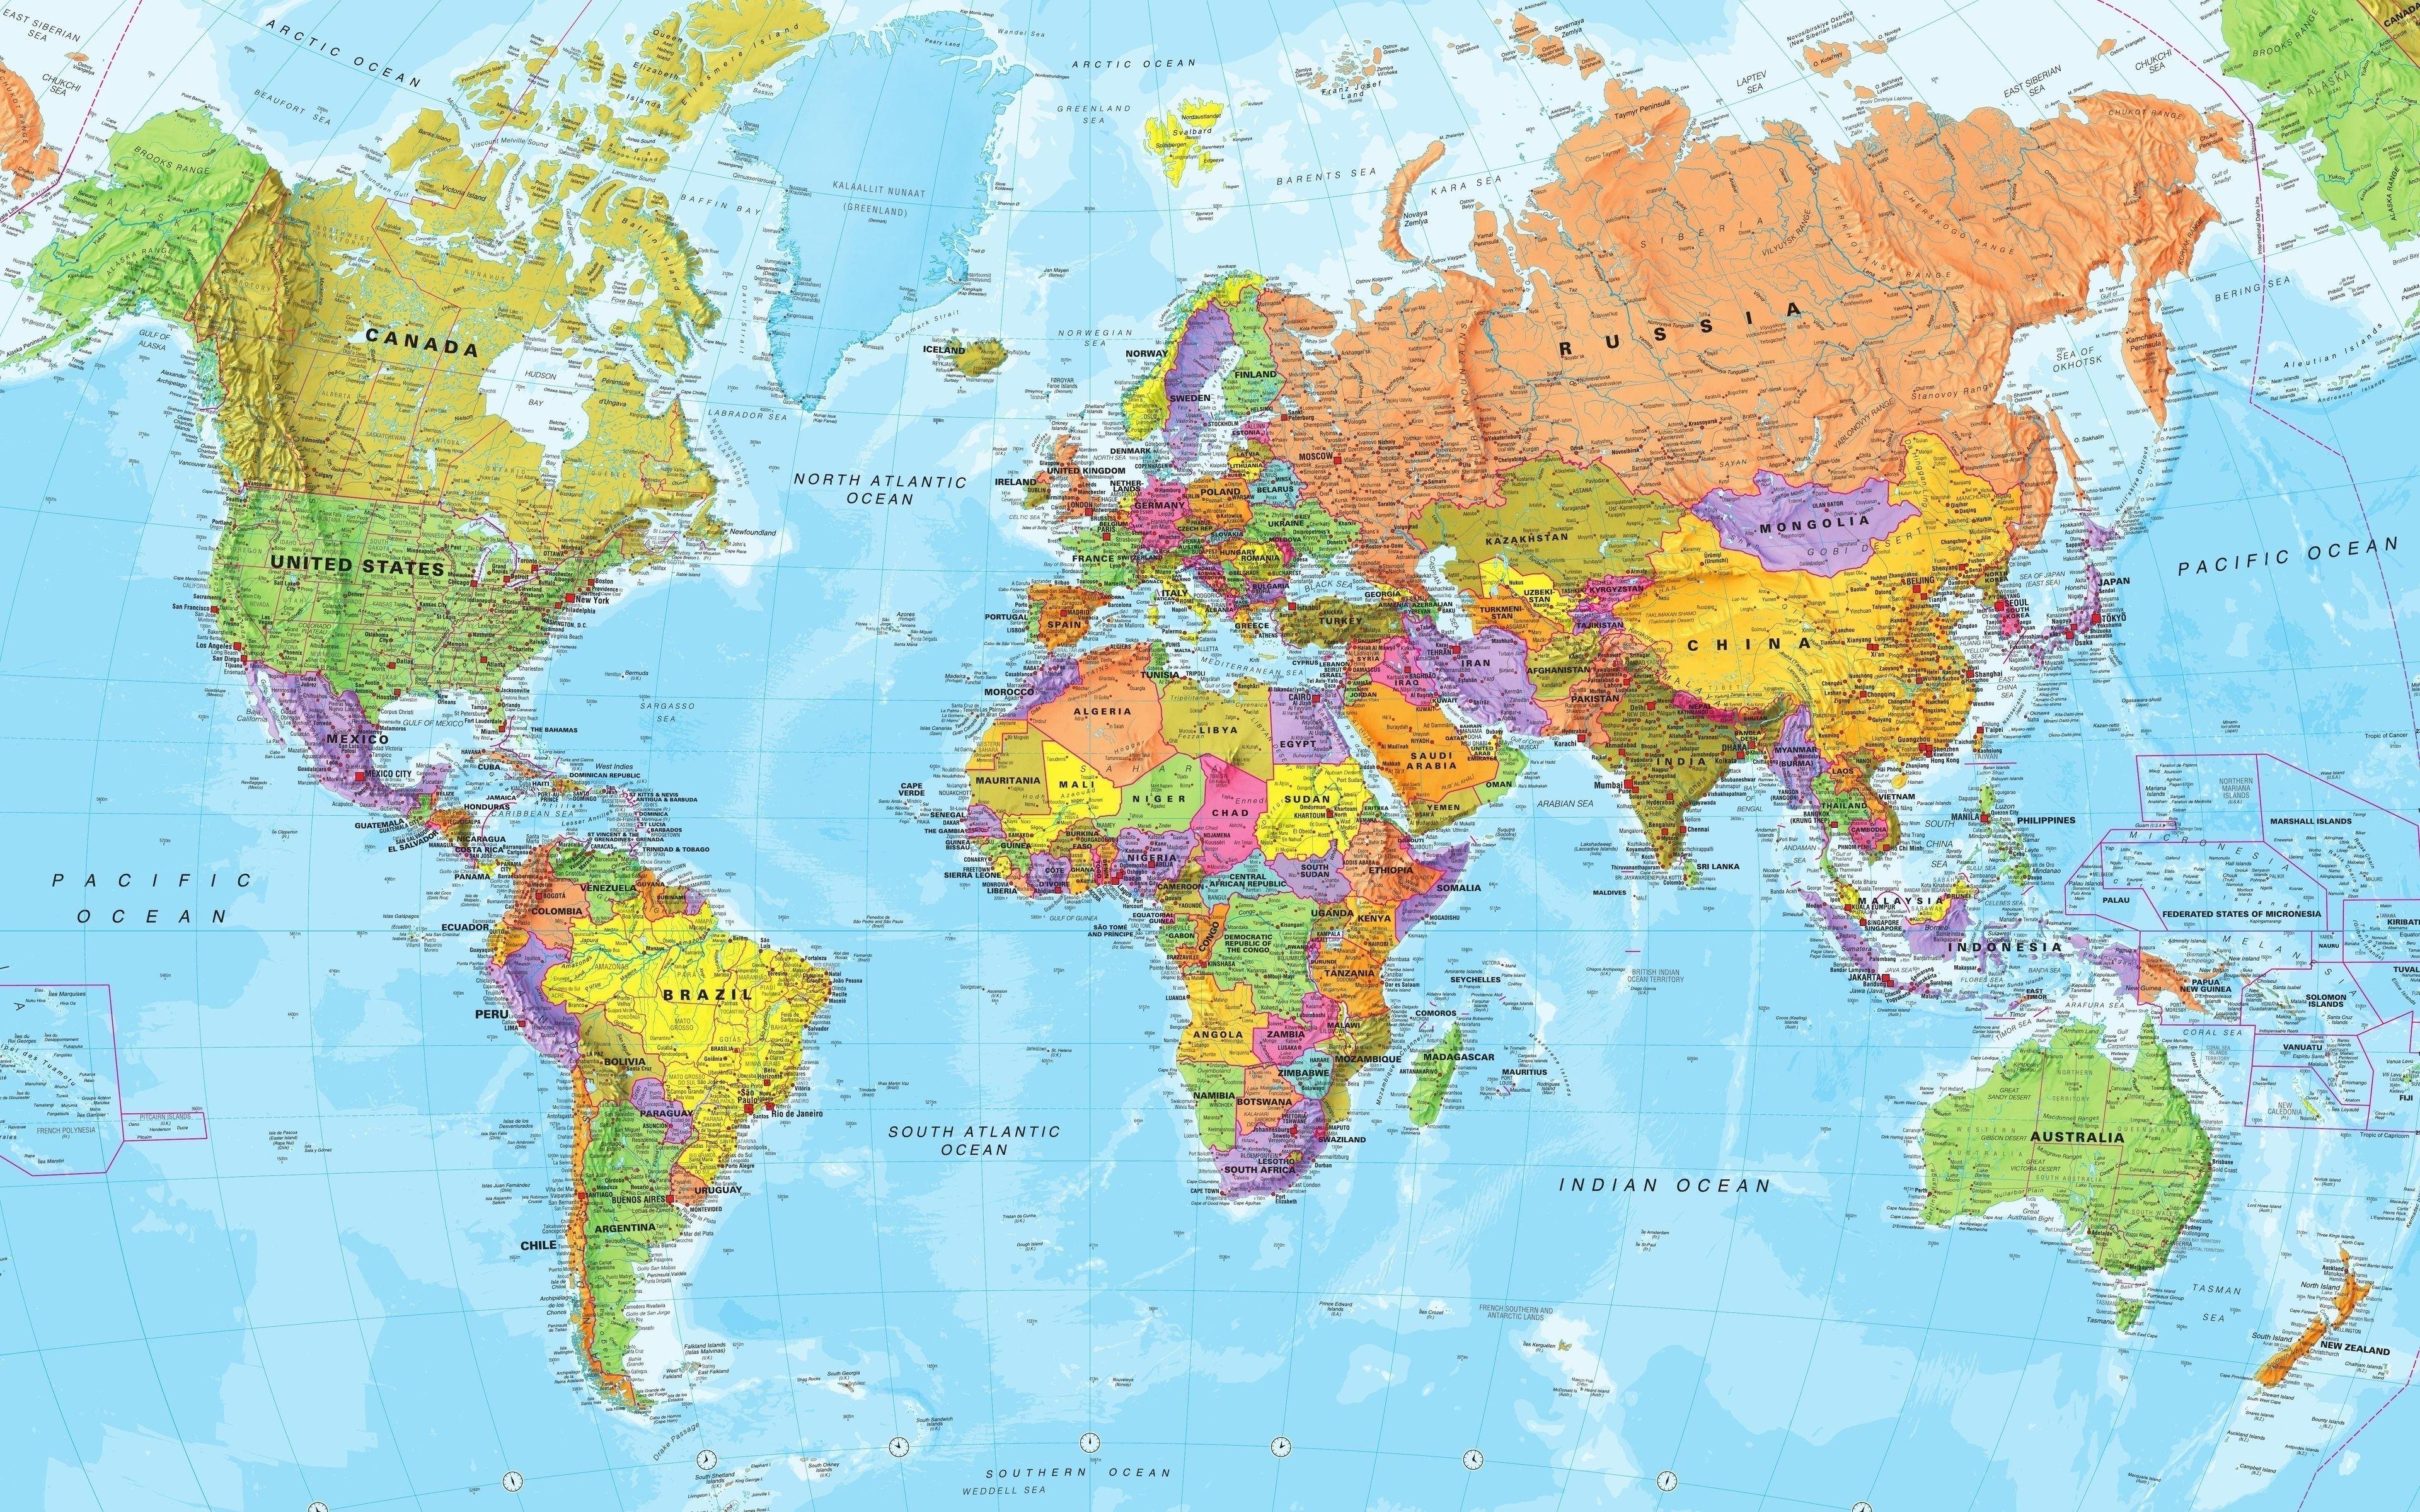 Mapa Del Mundo Paises Para Imprimir.Mapa Del Mundo Mapa Politico 4k Los Paises Del Mundo Los